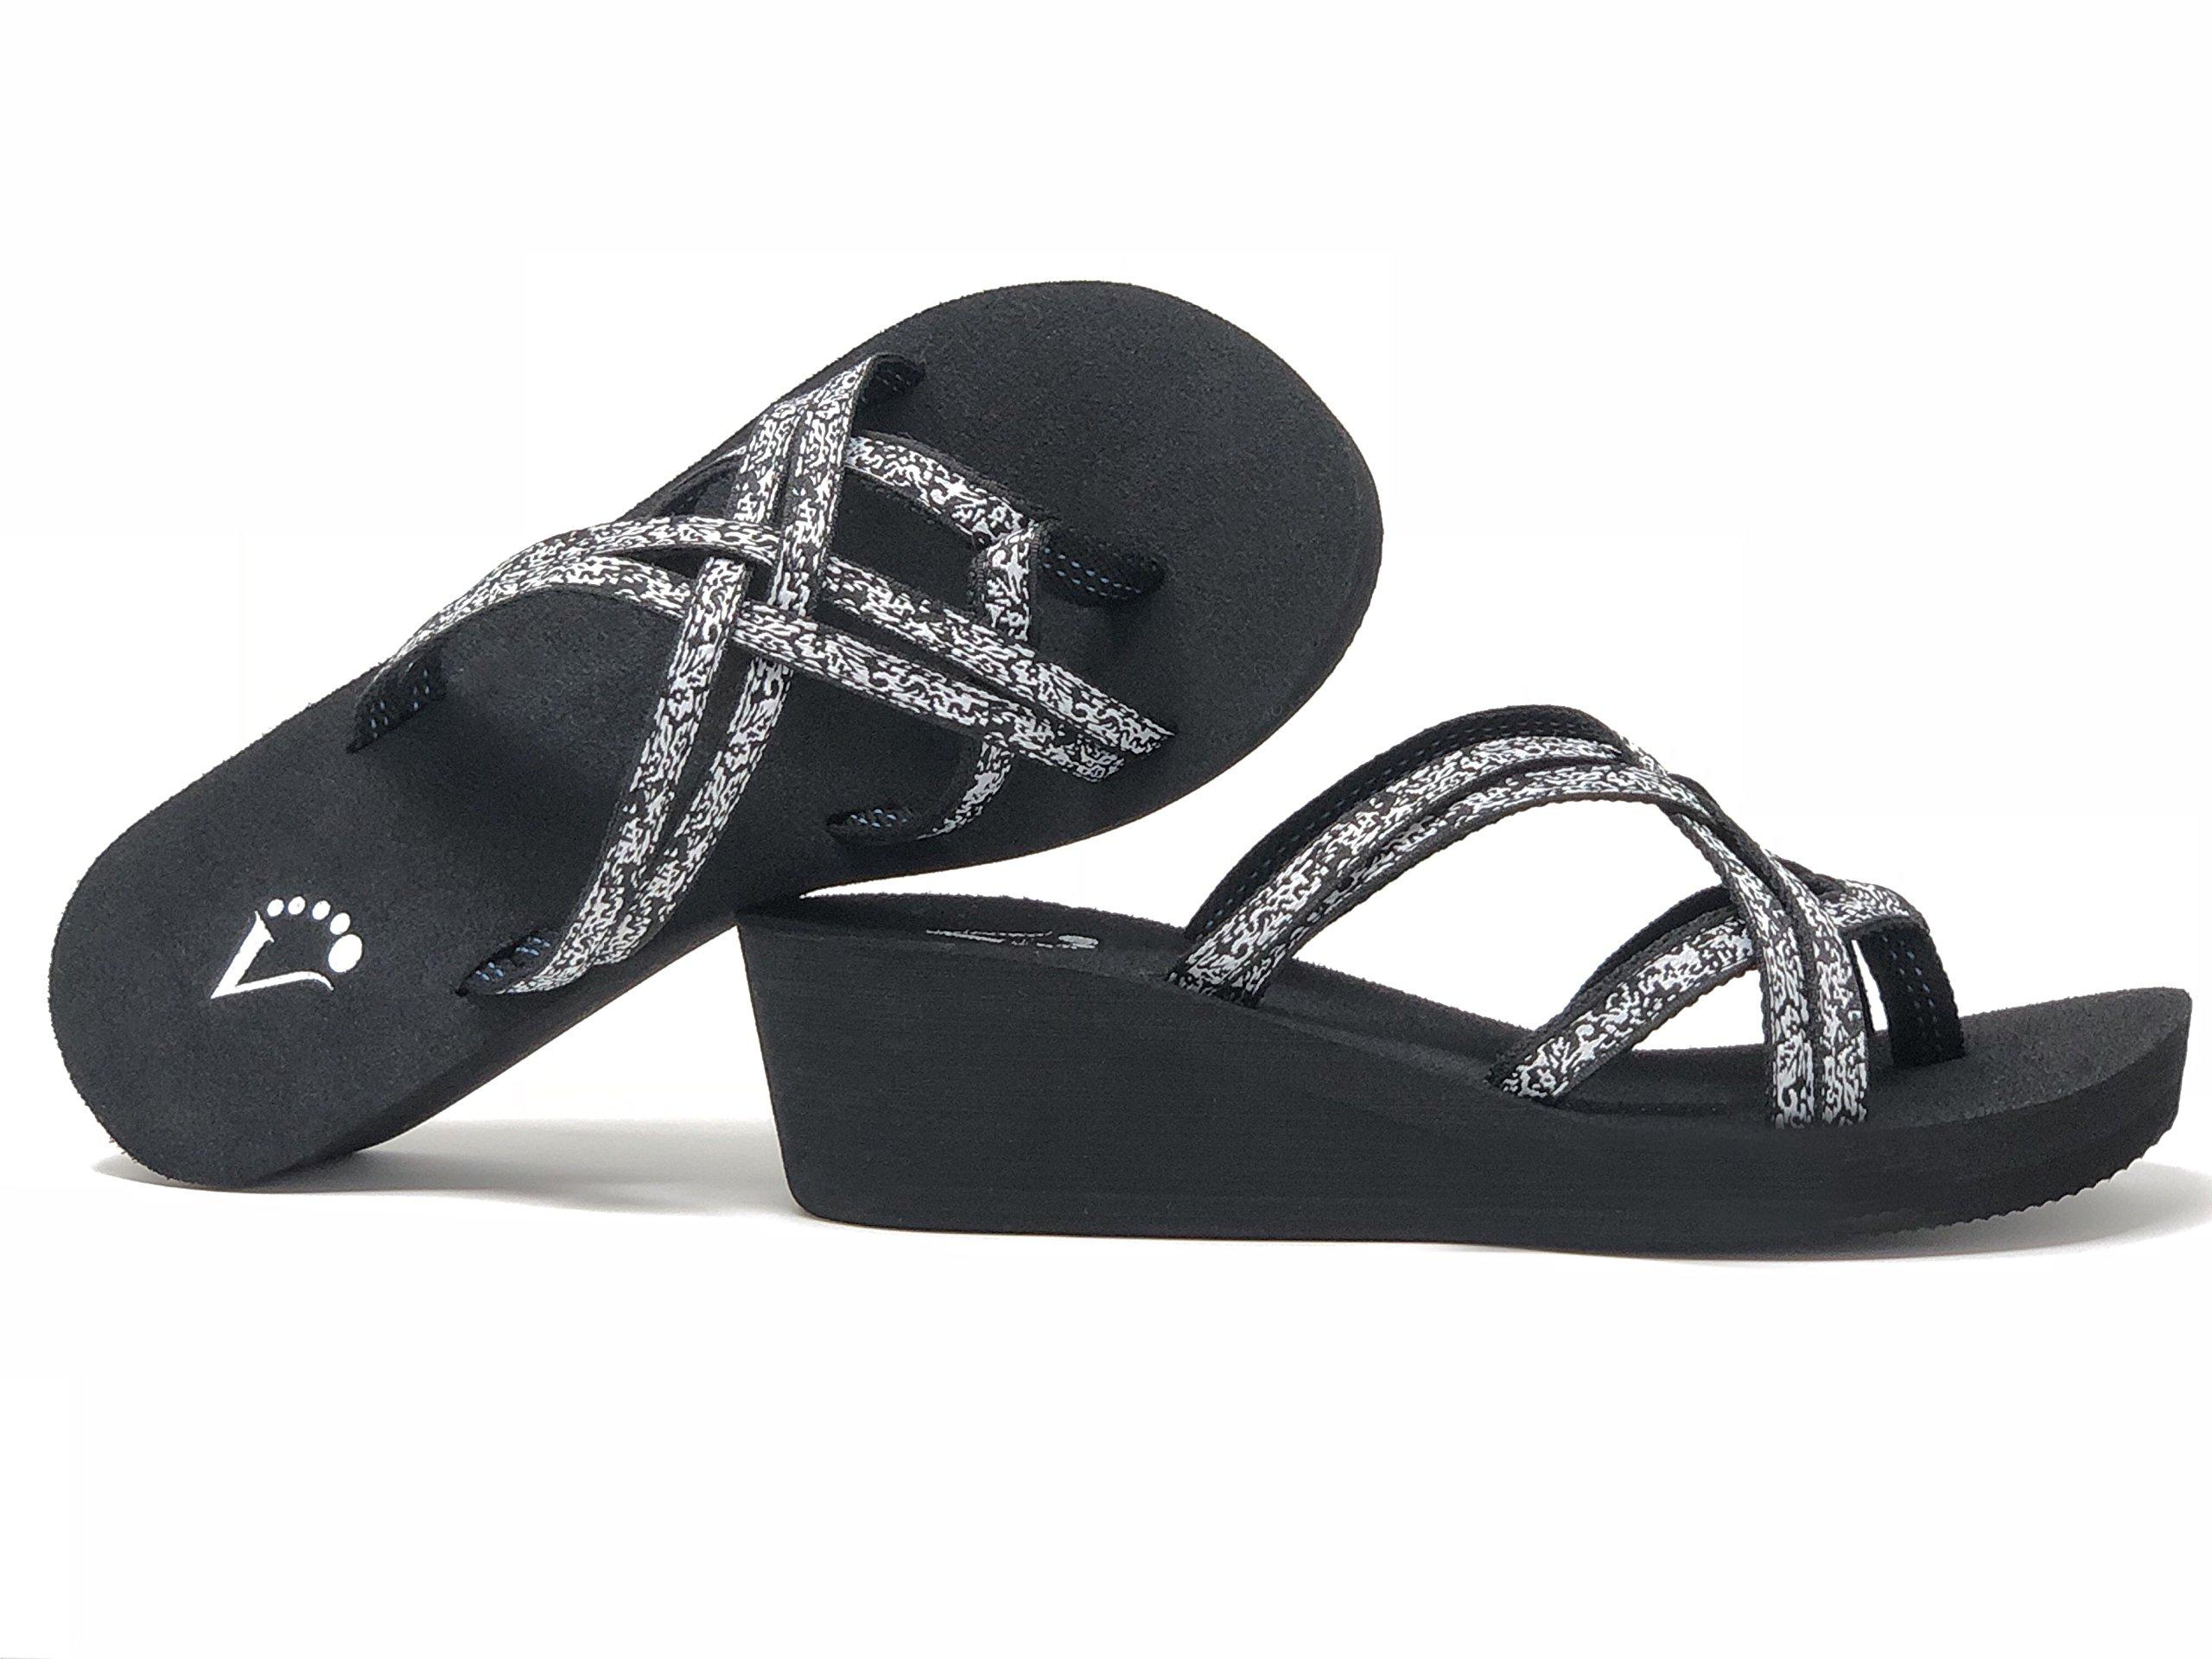 Viakix Wedge Flip Flops for Women – Comfortable, Stylish, Cute, Women's Strappy Sandal for Walking, Beach, Travel by Viakix (Image #8)